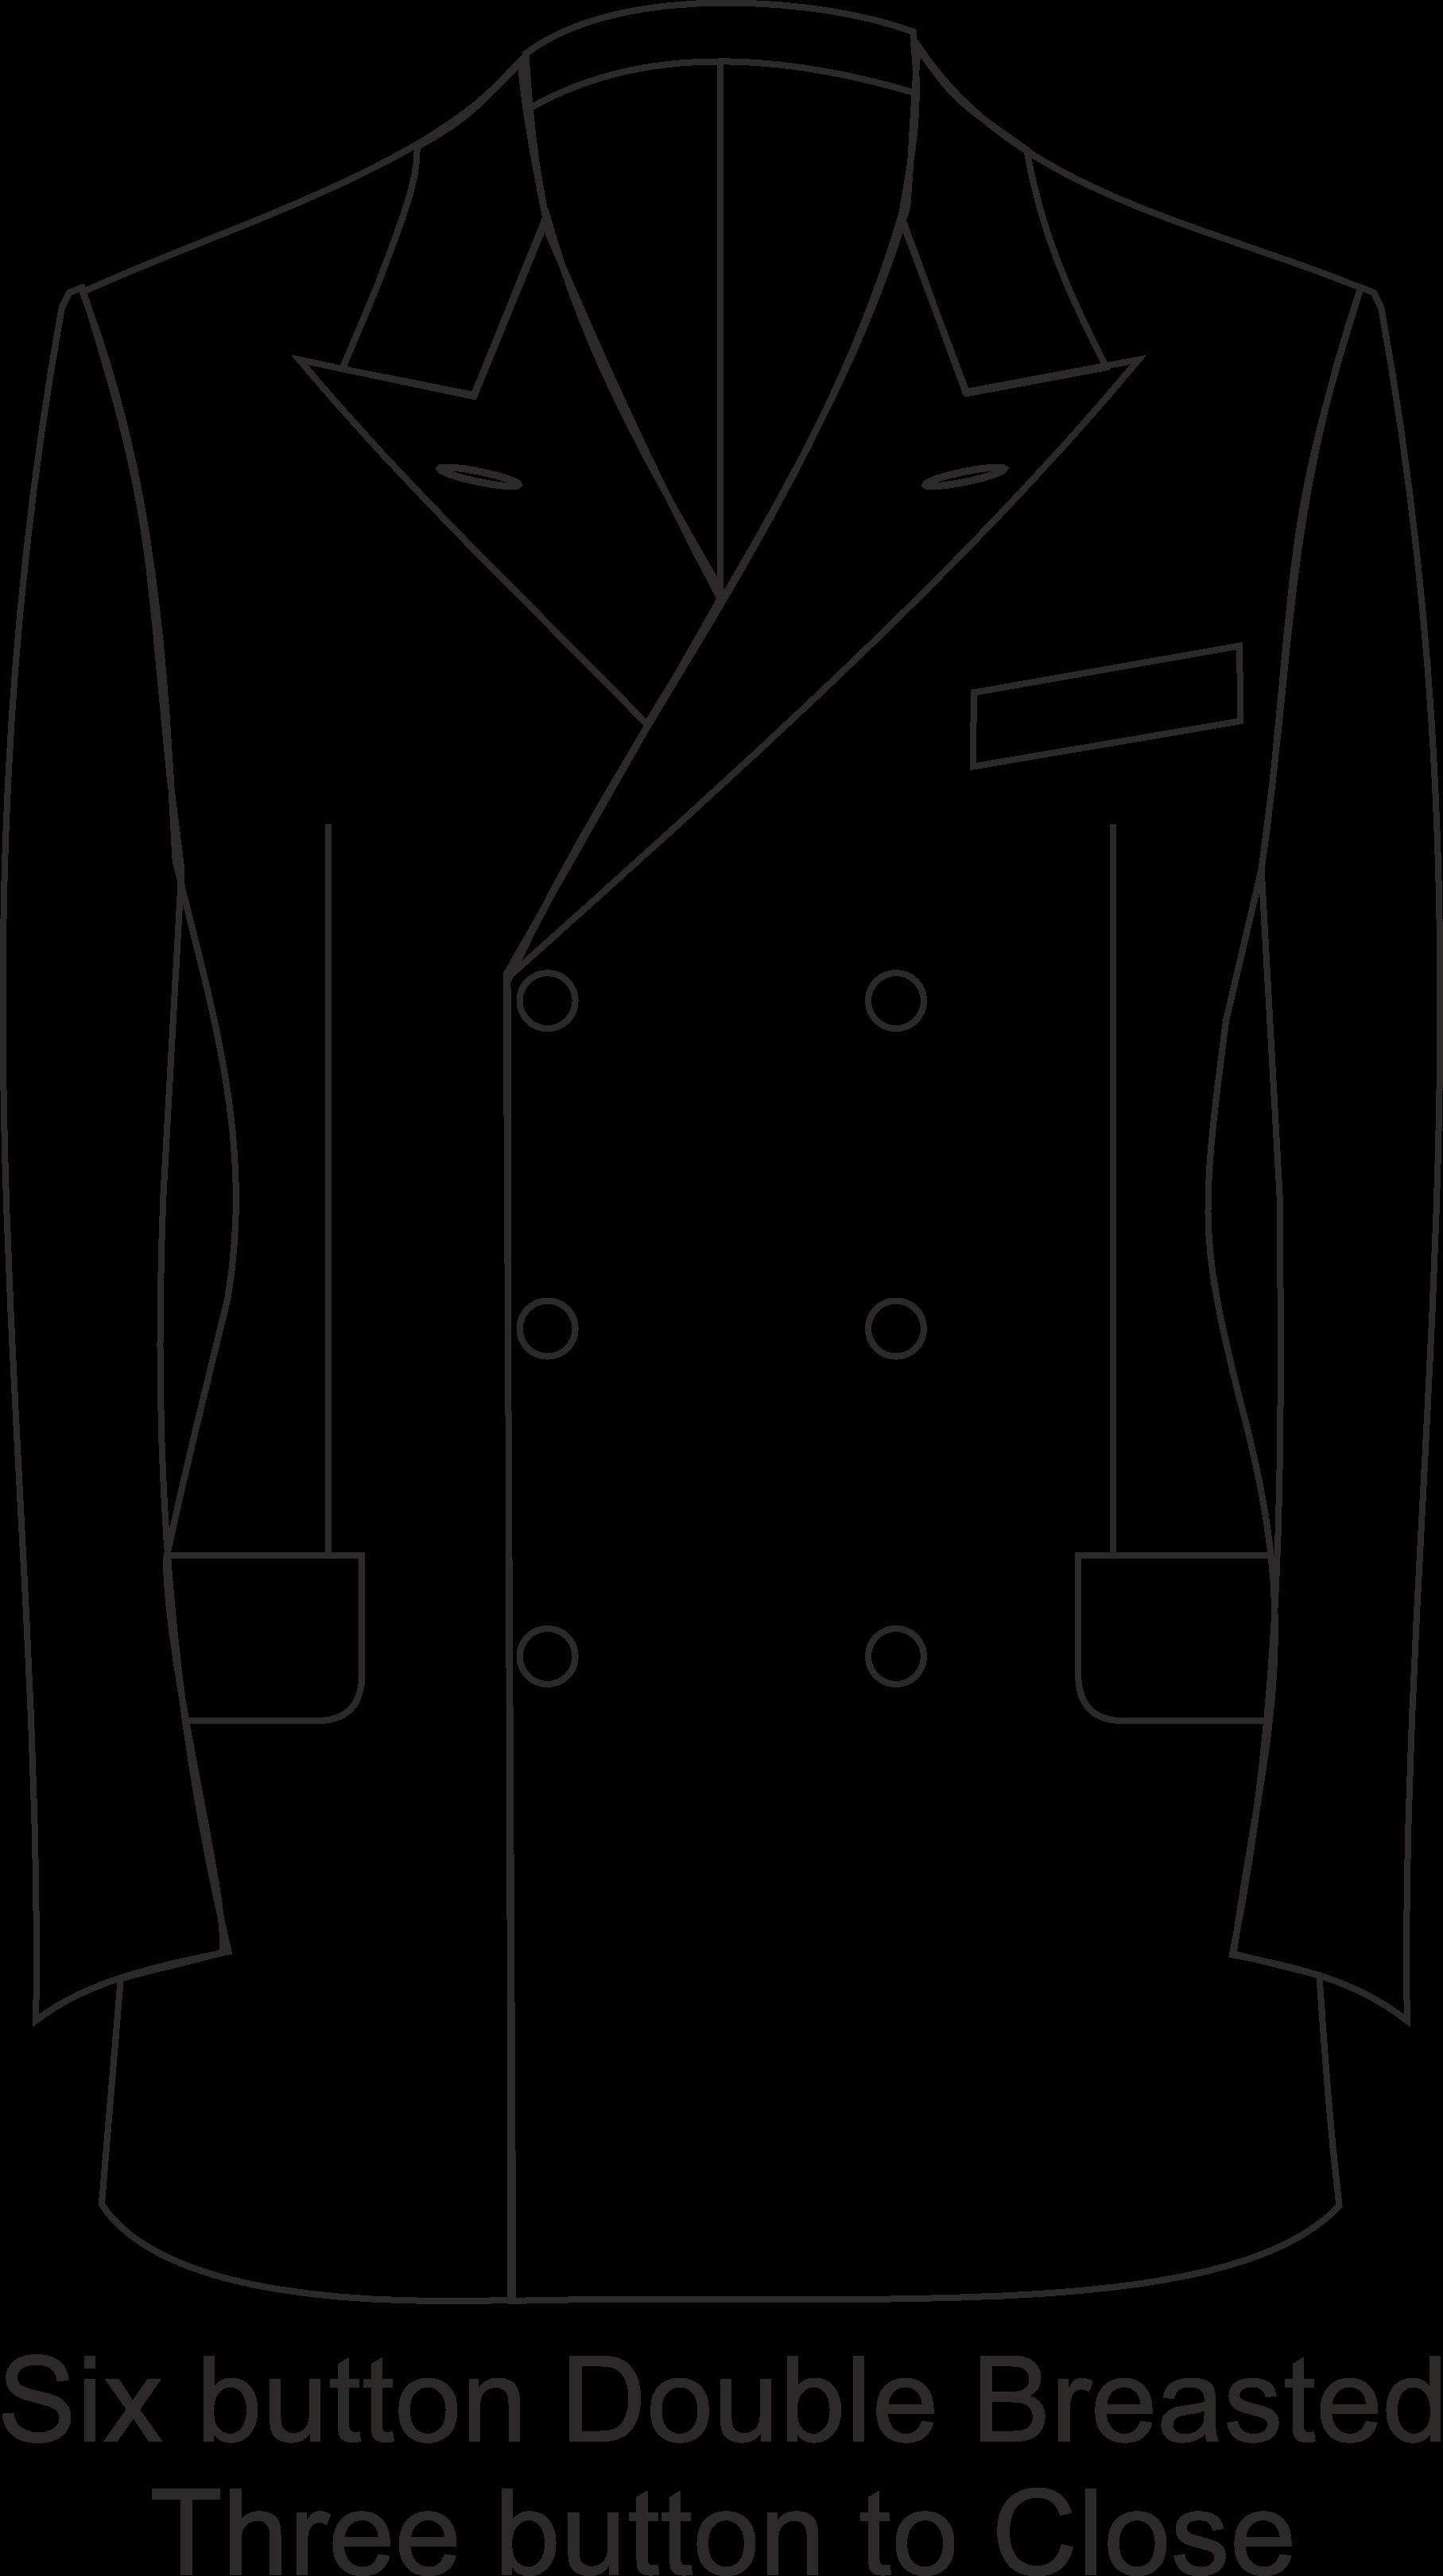 jacket-6bdb3tb